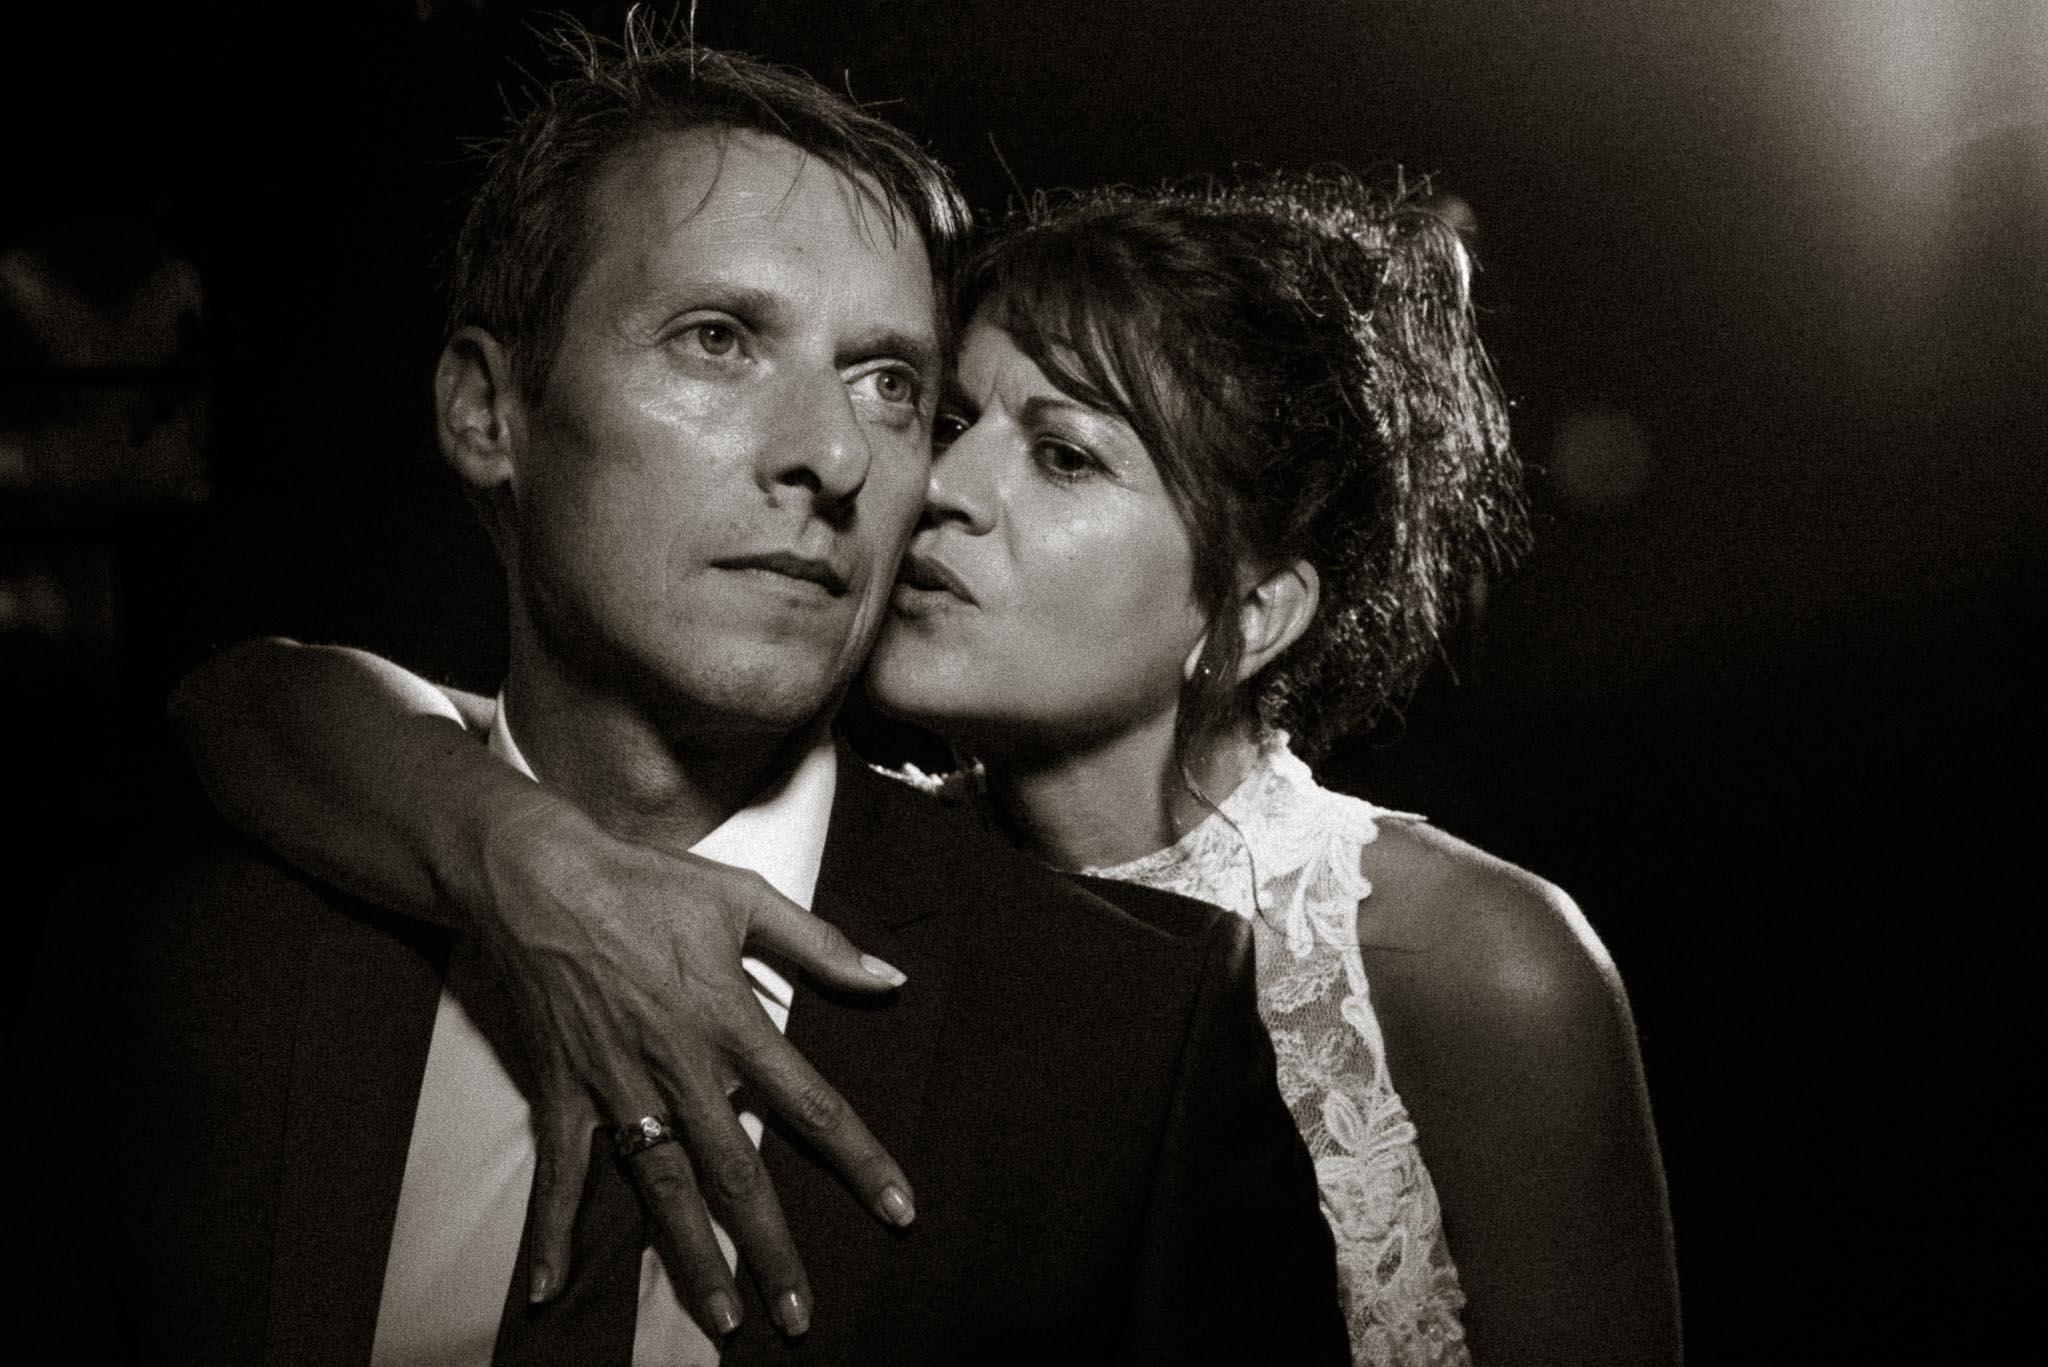 avis-photographe-Geoffrey-Arnoldy-le-temps-dune-pose-mariage-nantes-reportage-lifestyle